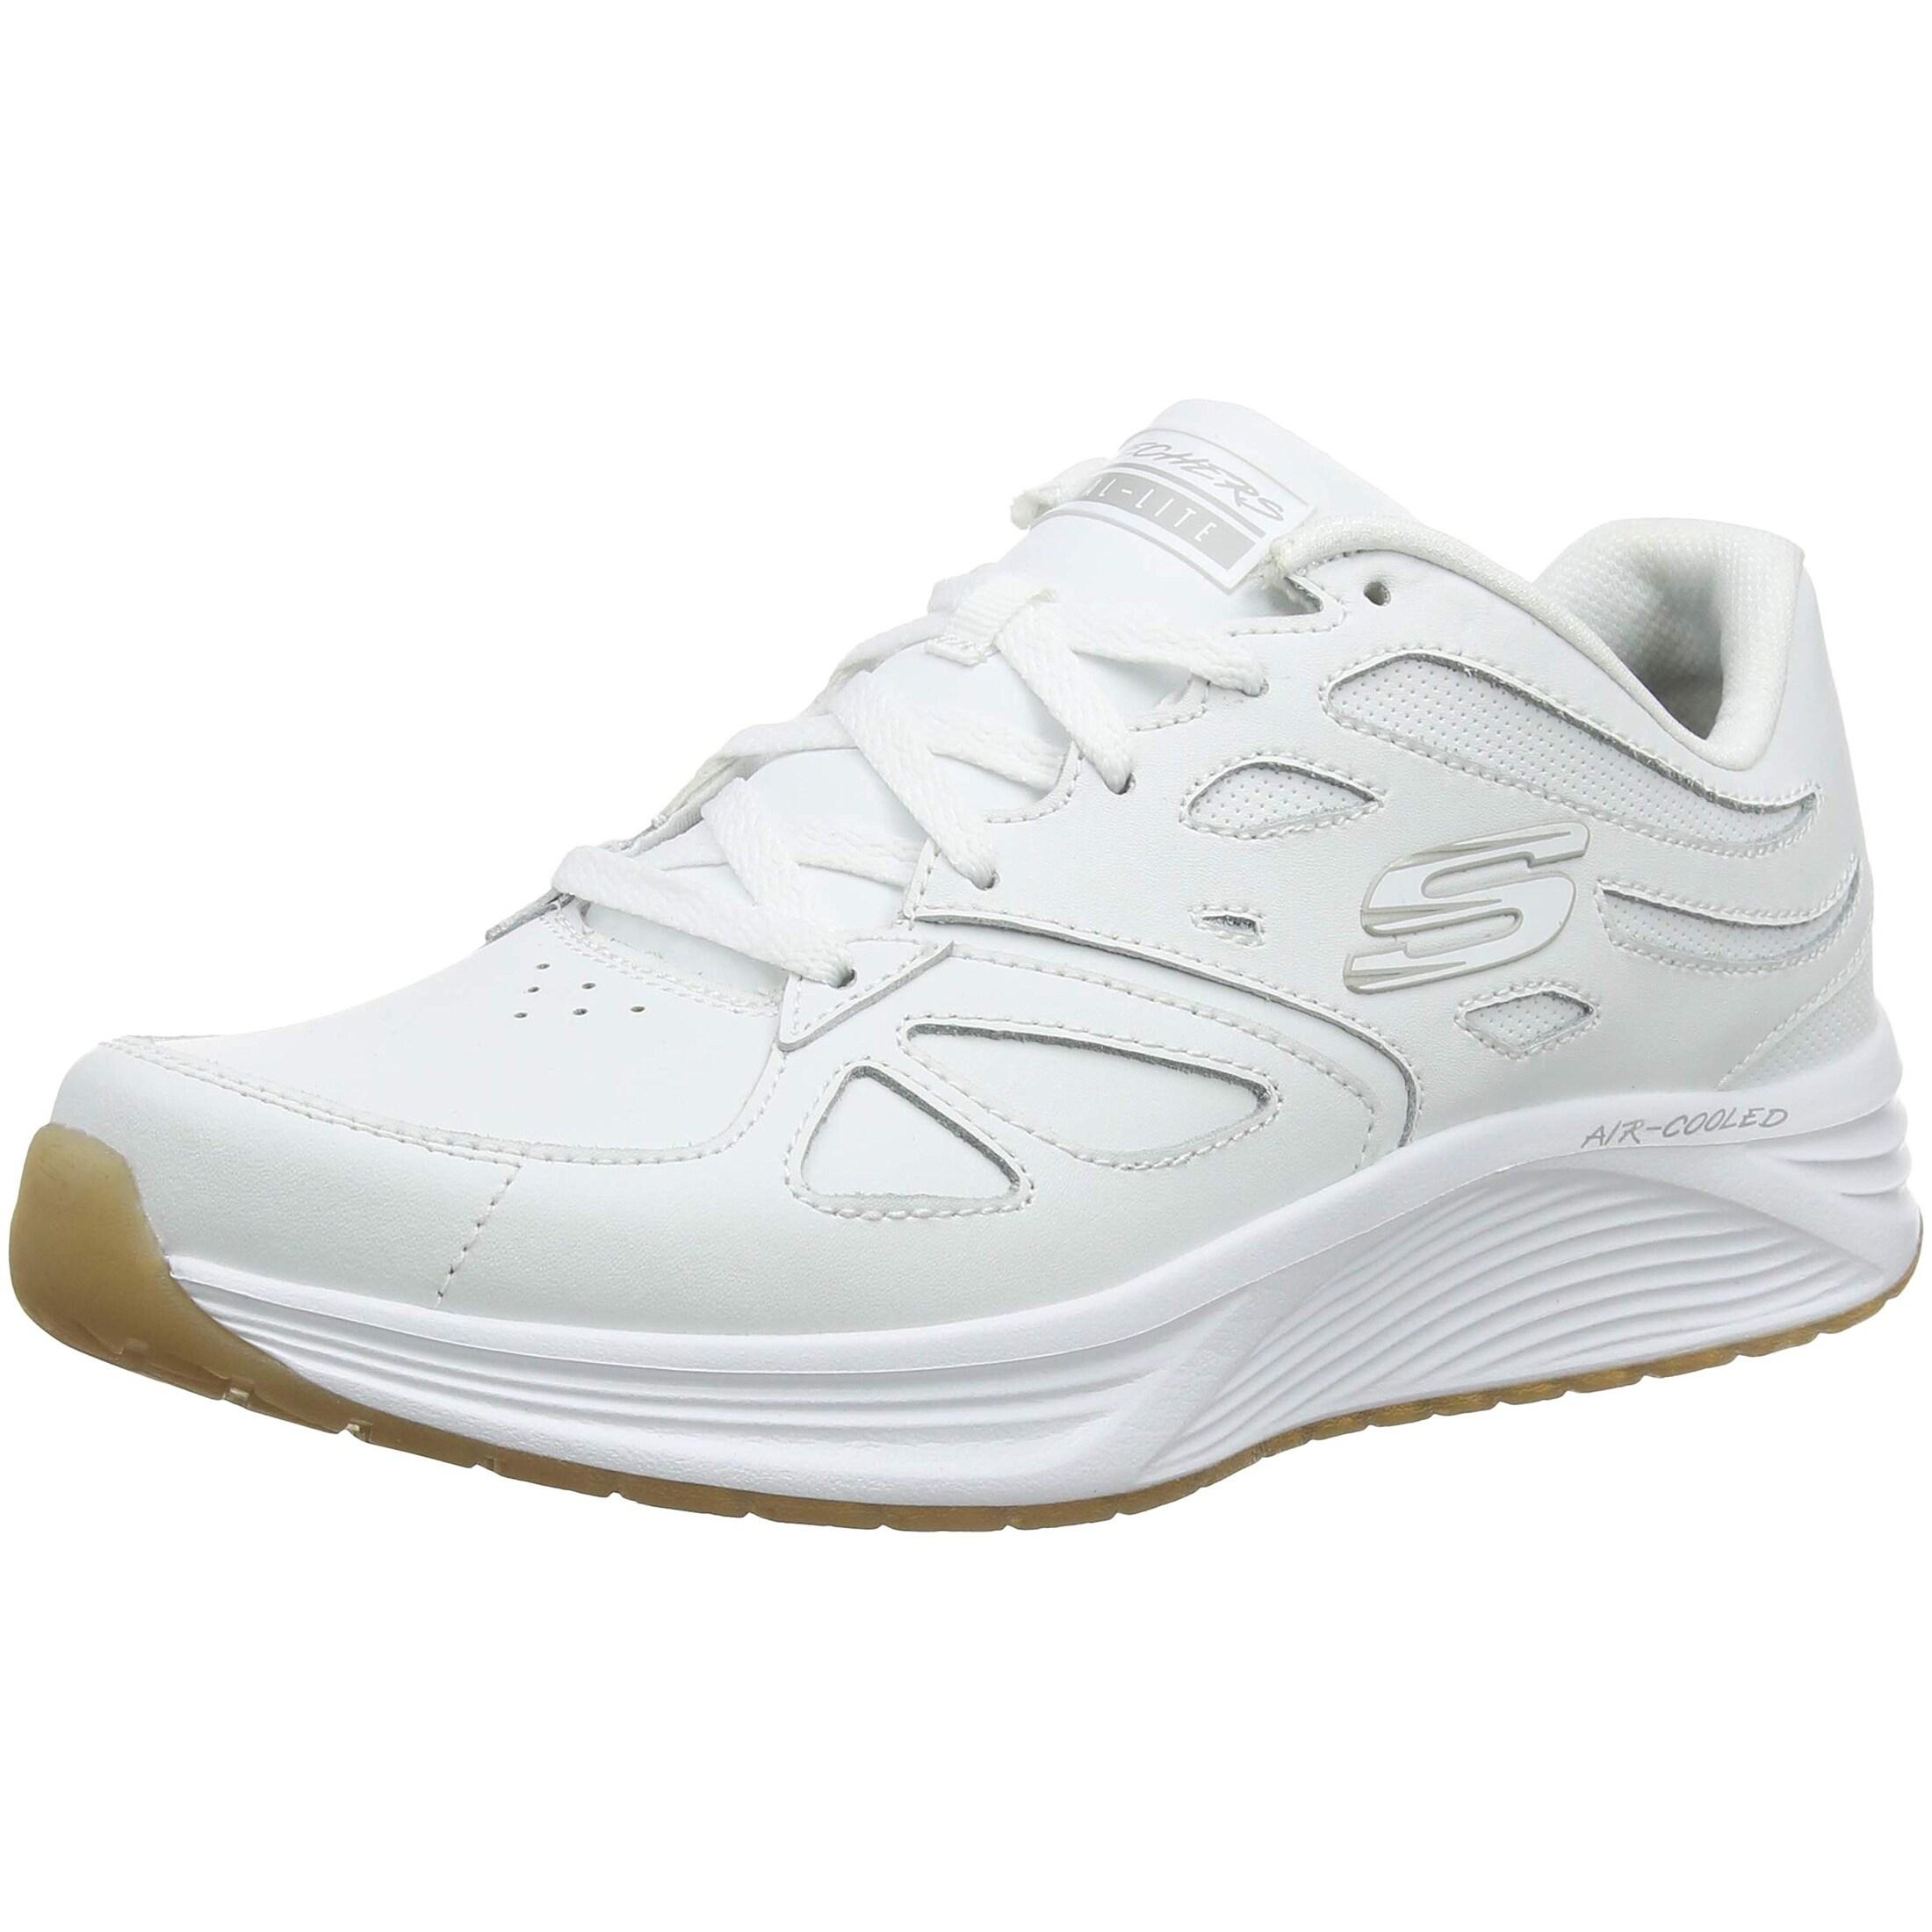 Skechers Men's Skyline Woodmist White Casual Shoe 10.5 Men Us